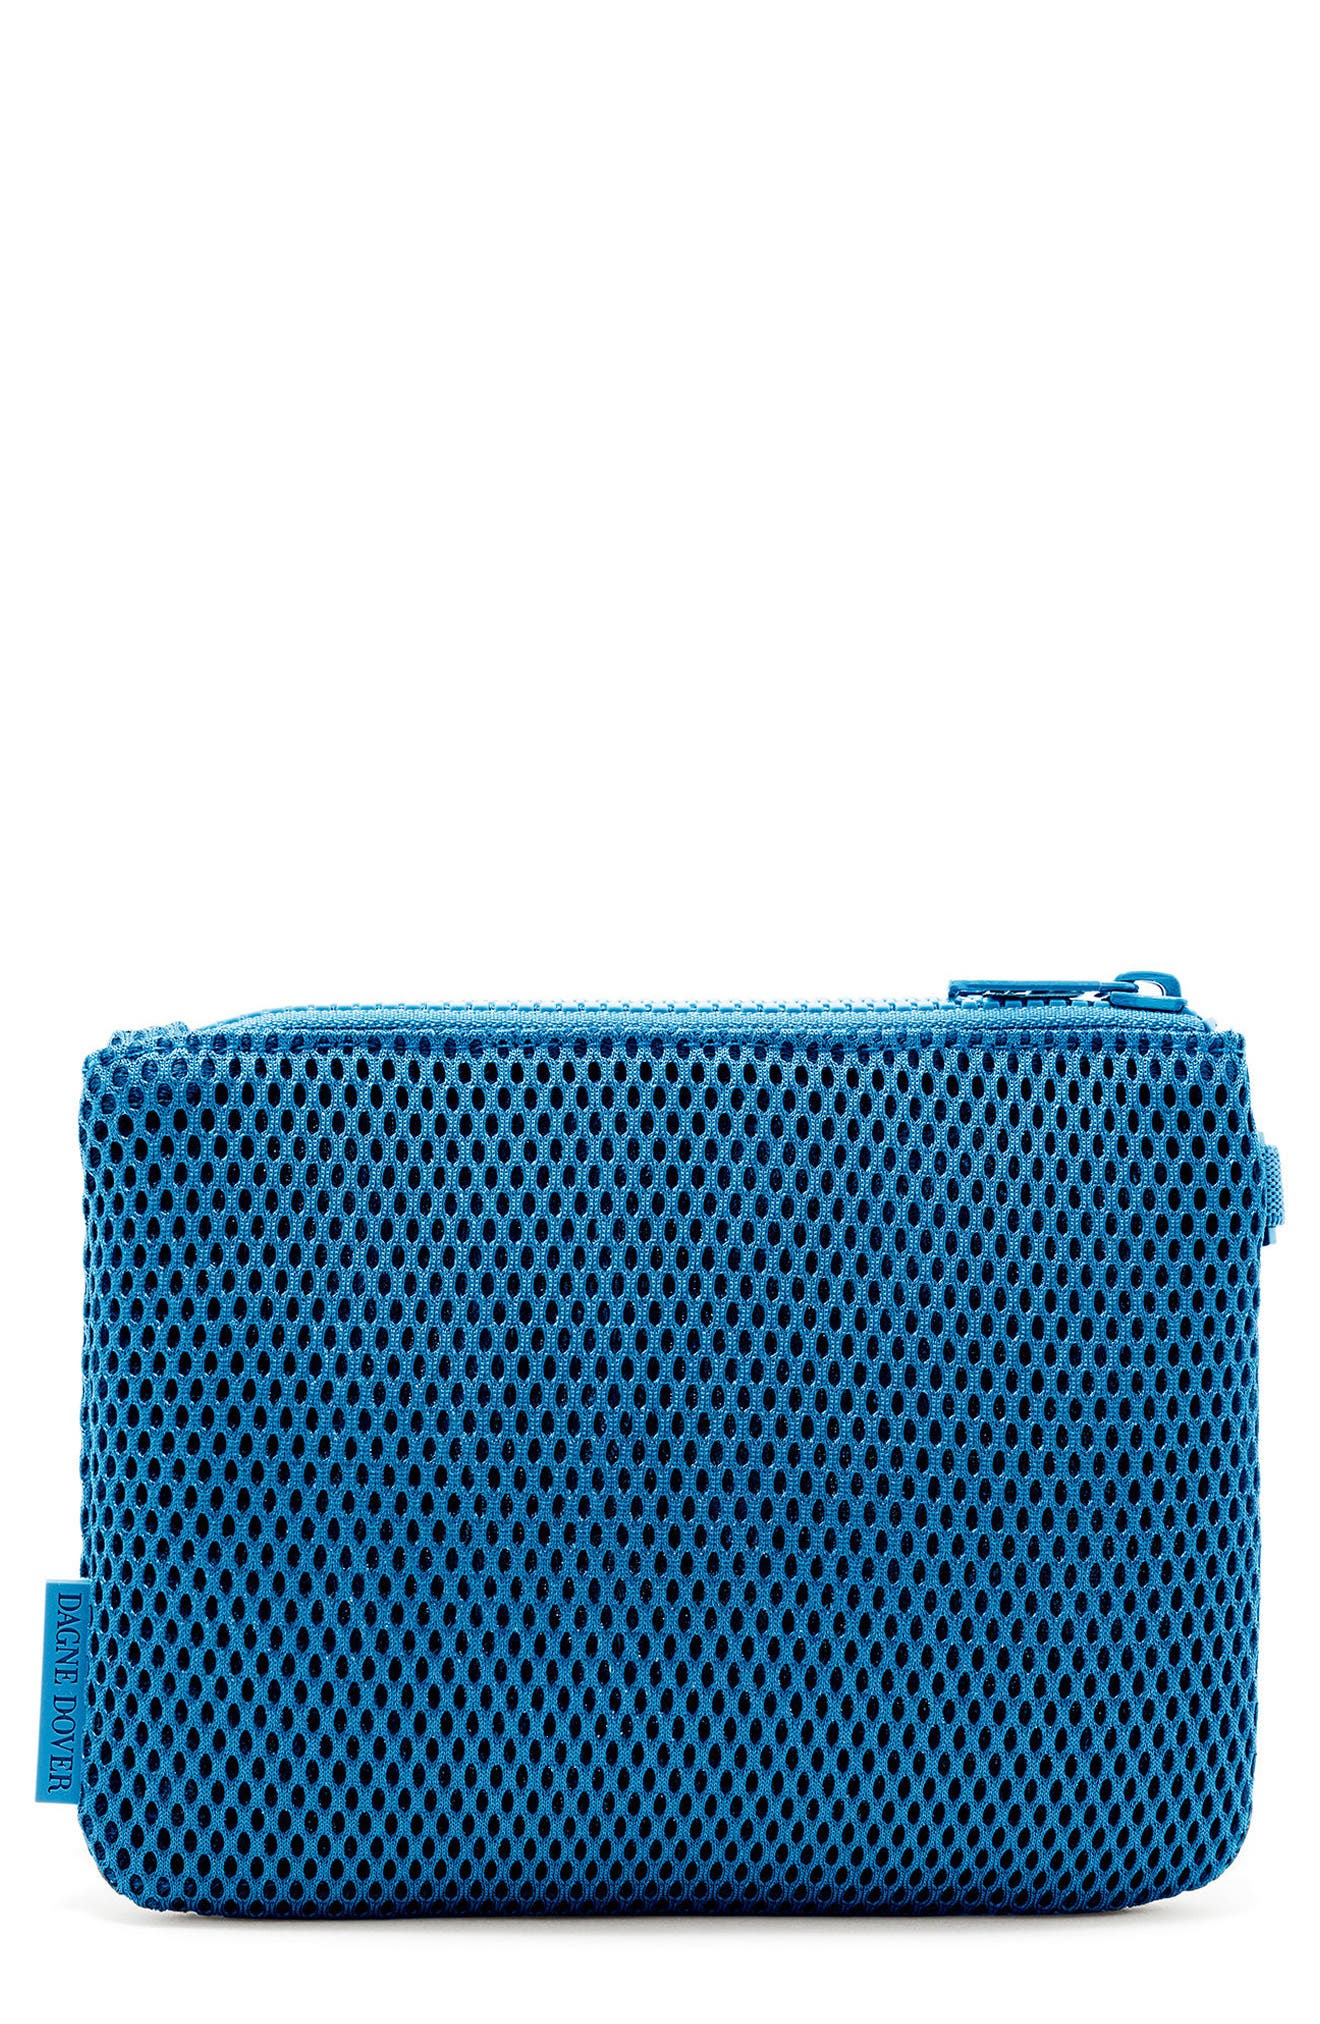 SMALL PARKER MESH POUCH - BLUE